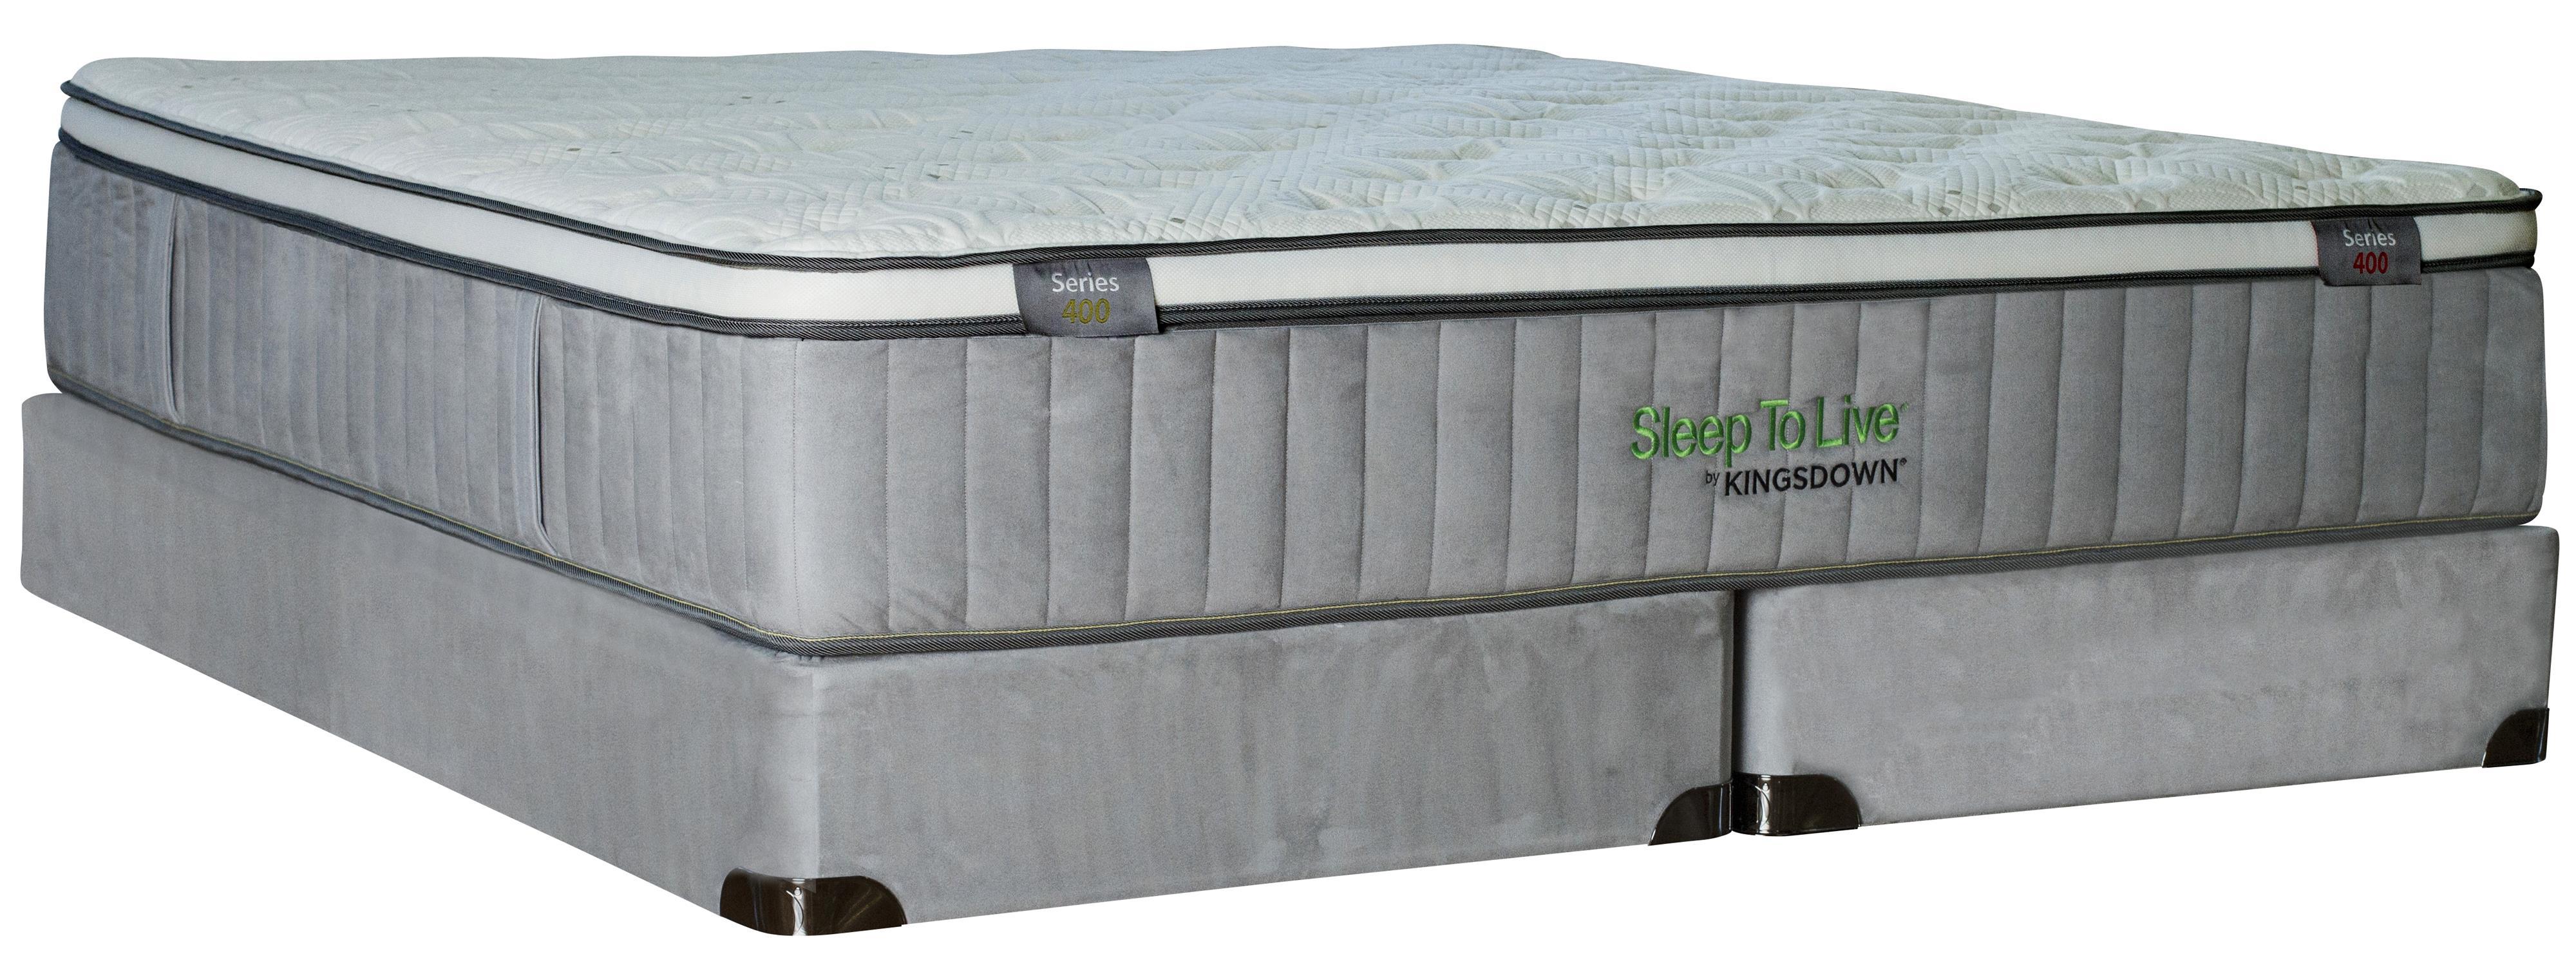 Kingsdown Sleep To Live 400 Twin XL Euro Top Mattress Set with Memory Fm - Item Number: Series400-TXL+1128SFH-TXL